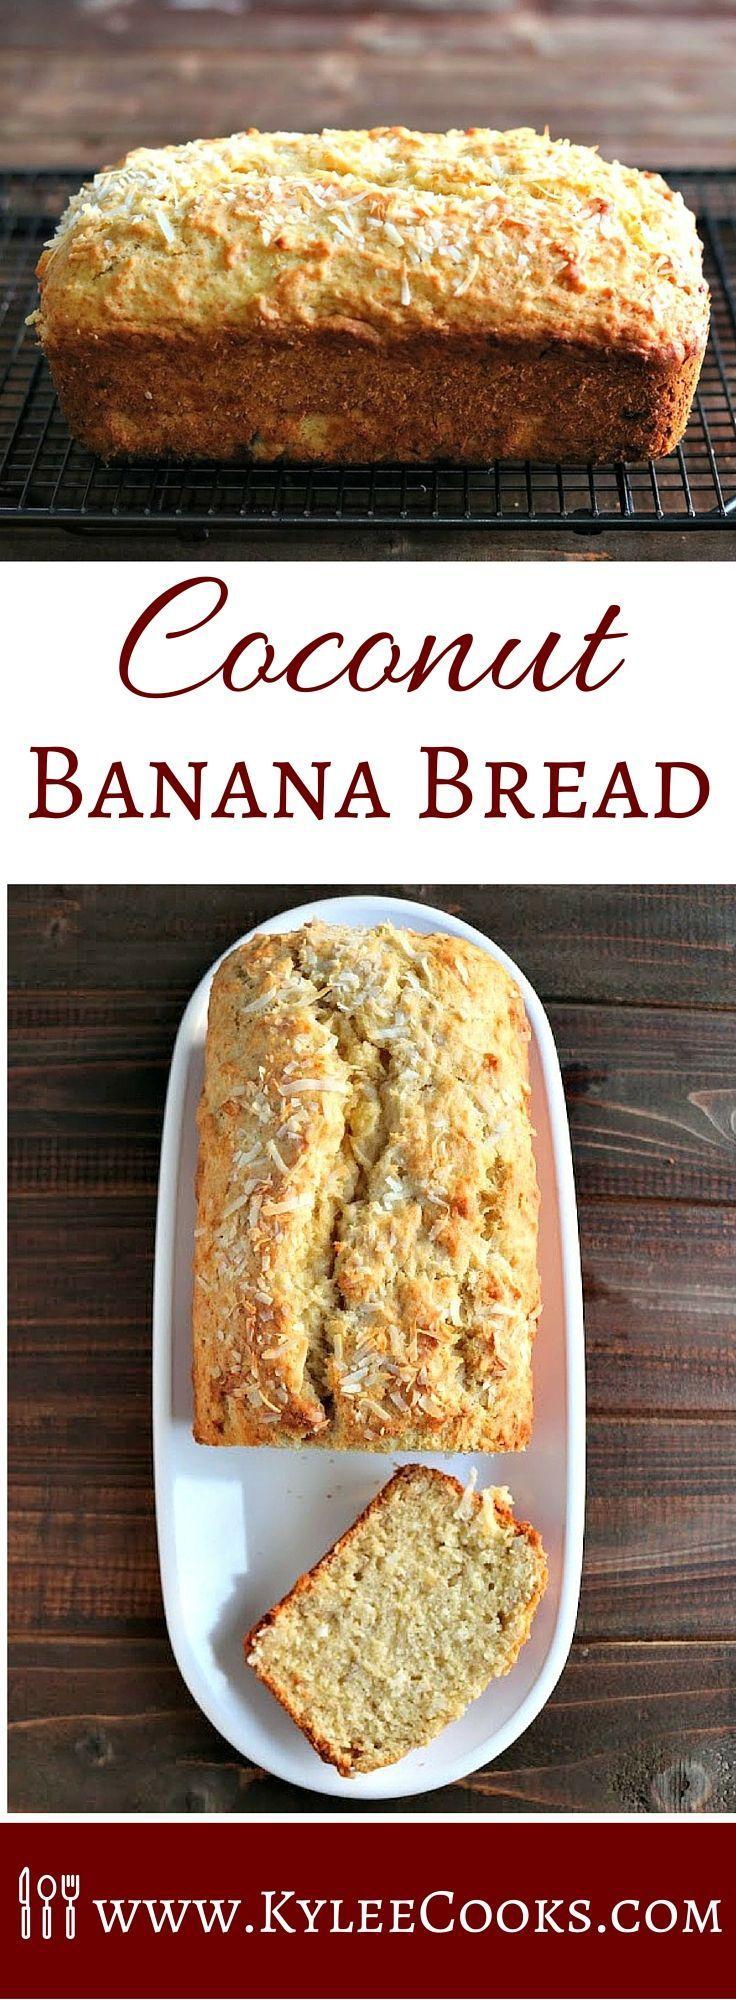 760 best banana bread recipes images on pinterest banana bread coconut banana bread forumfinder Gallery